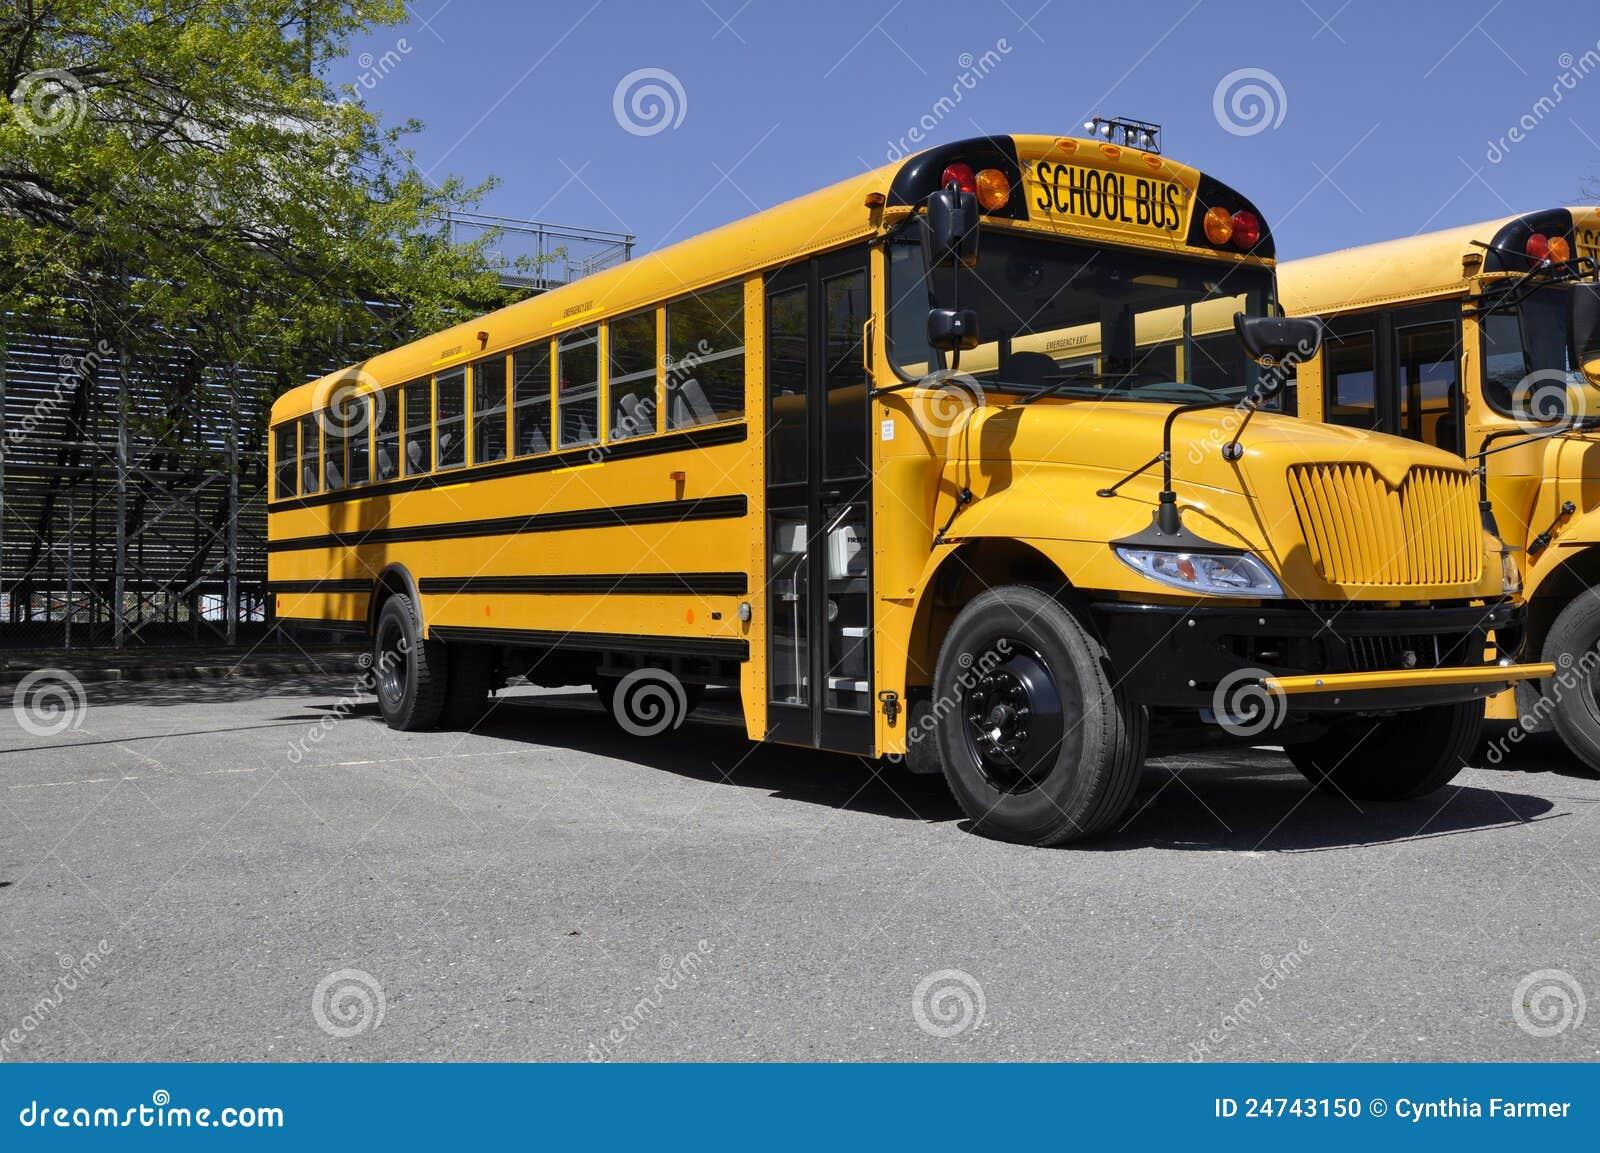 One yellow school bus